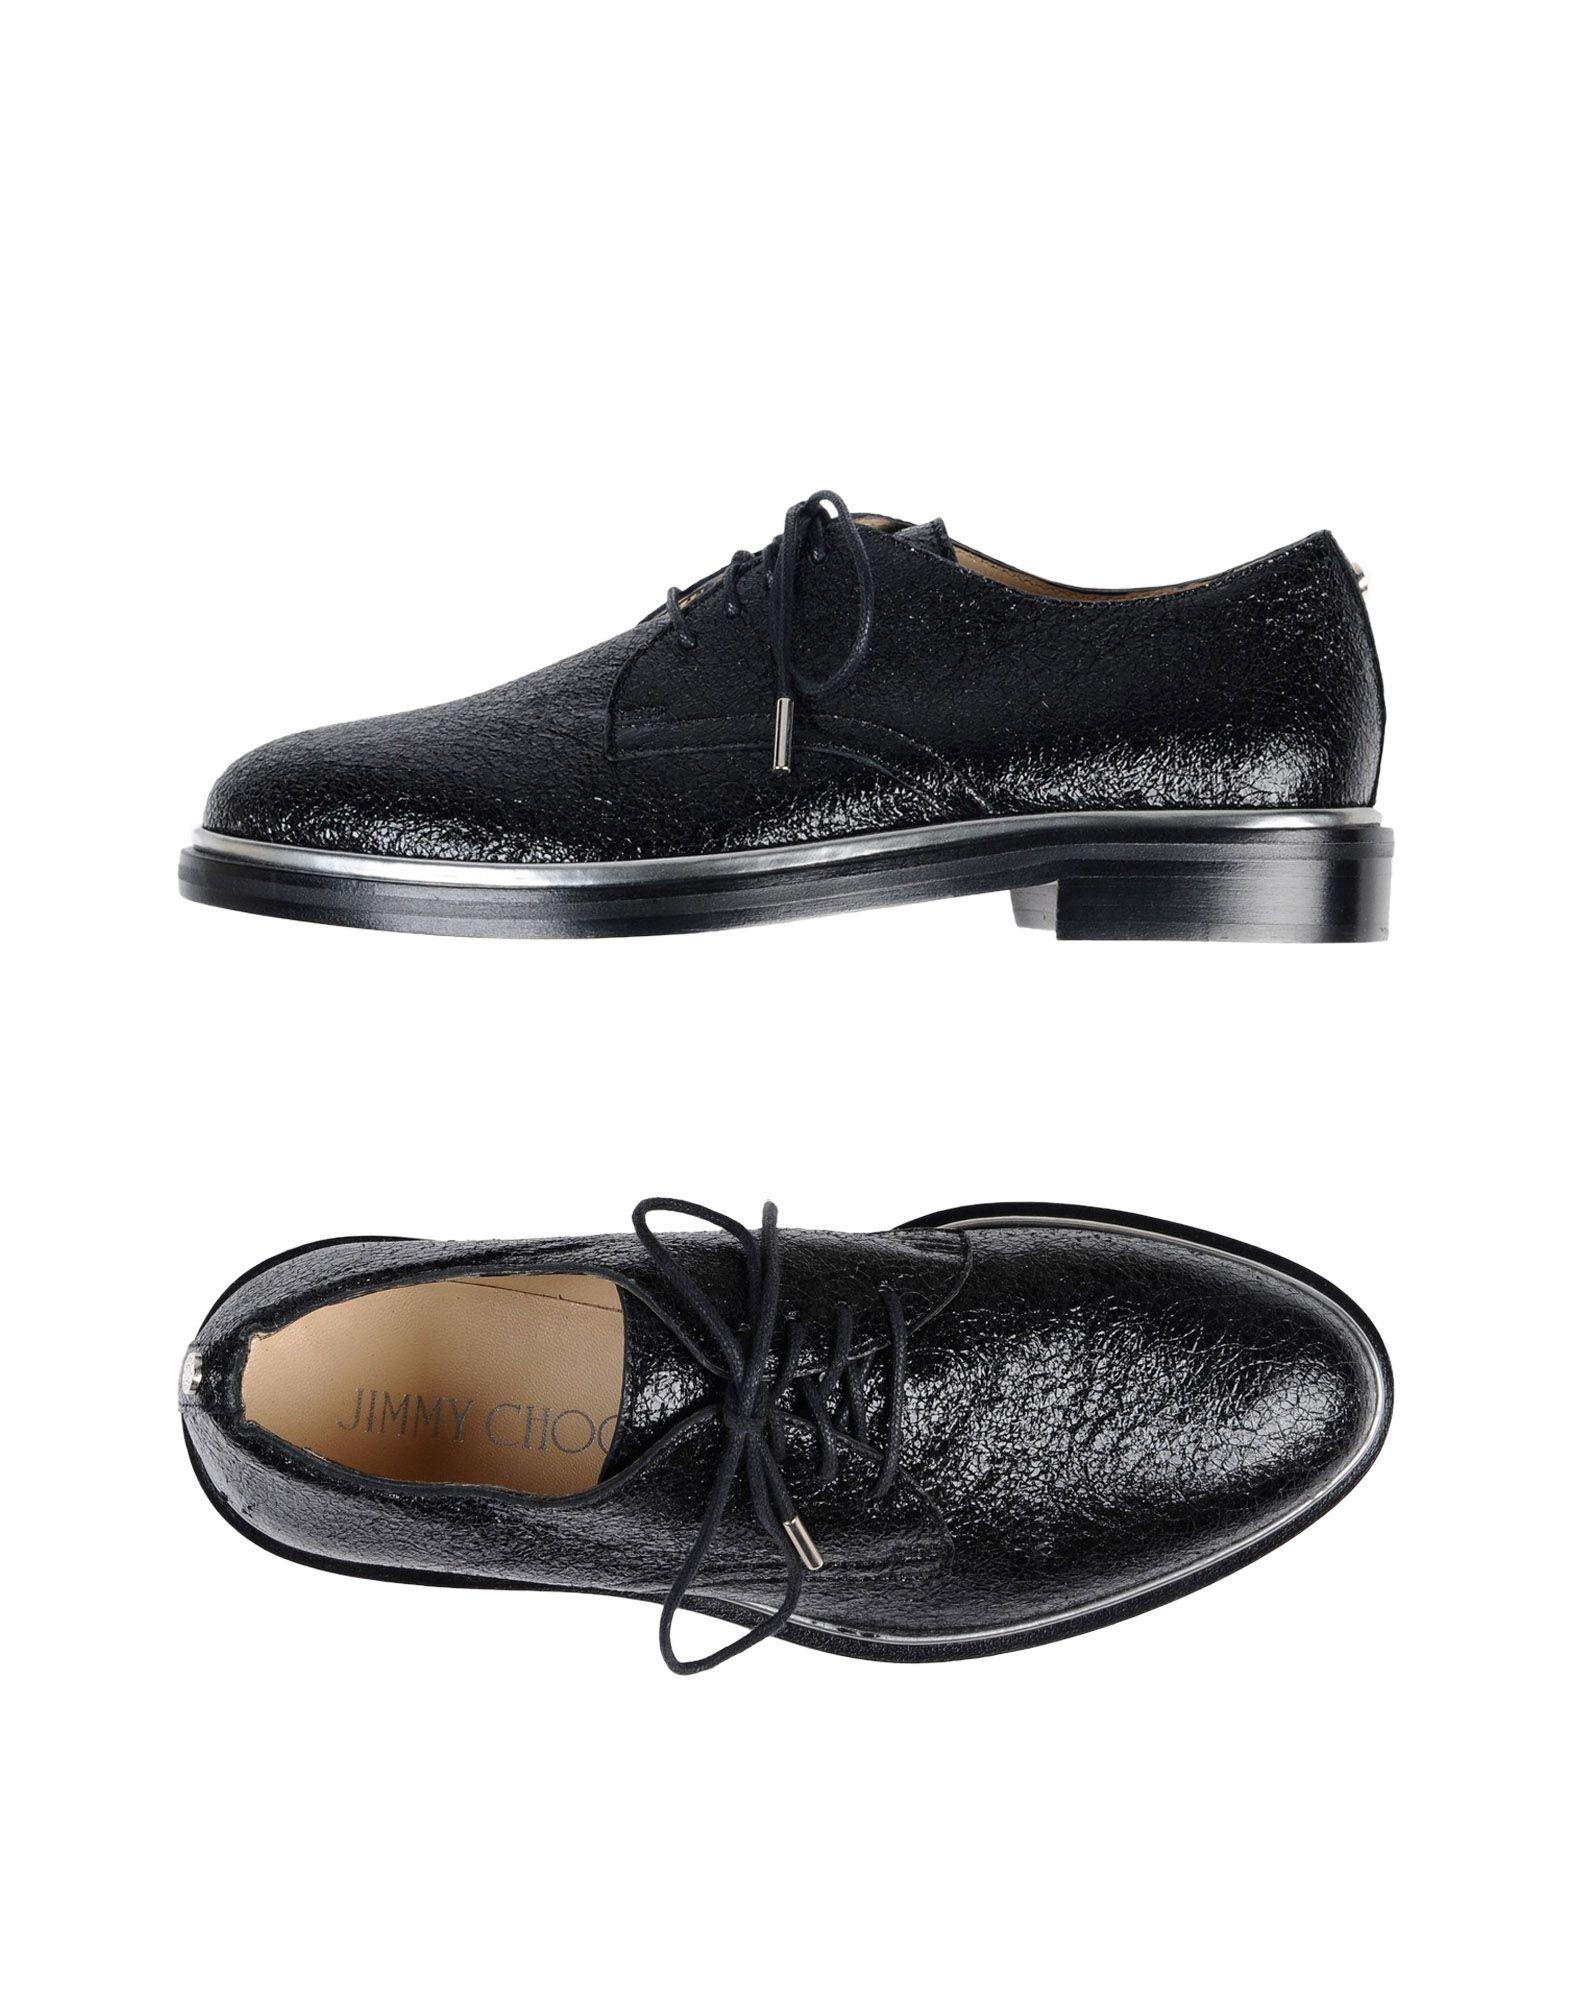 JIMMY CHOO Обувь на шнурках jimmy choo обувь в москве